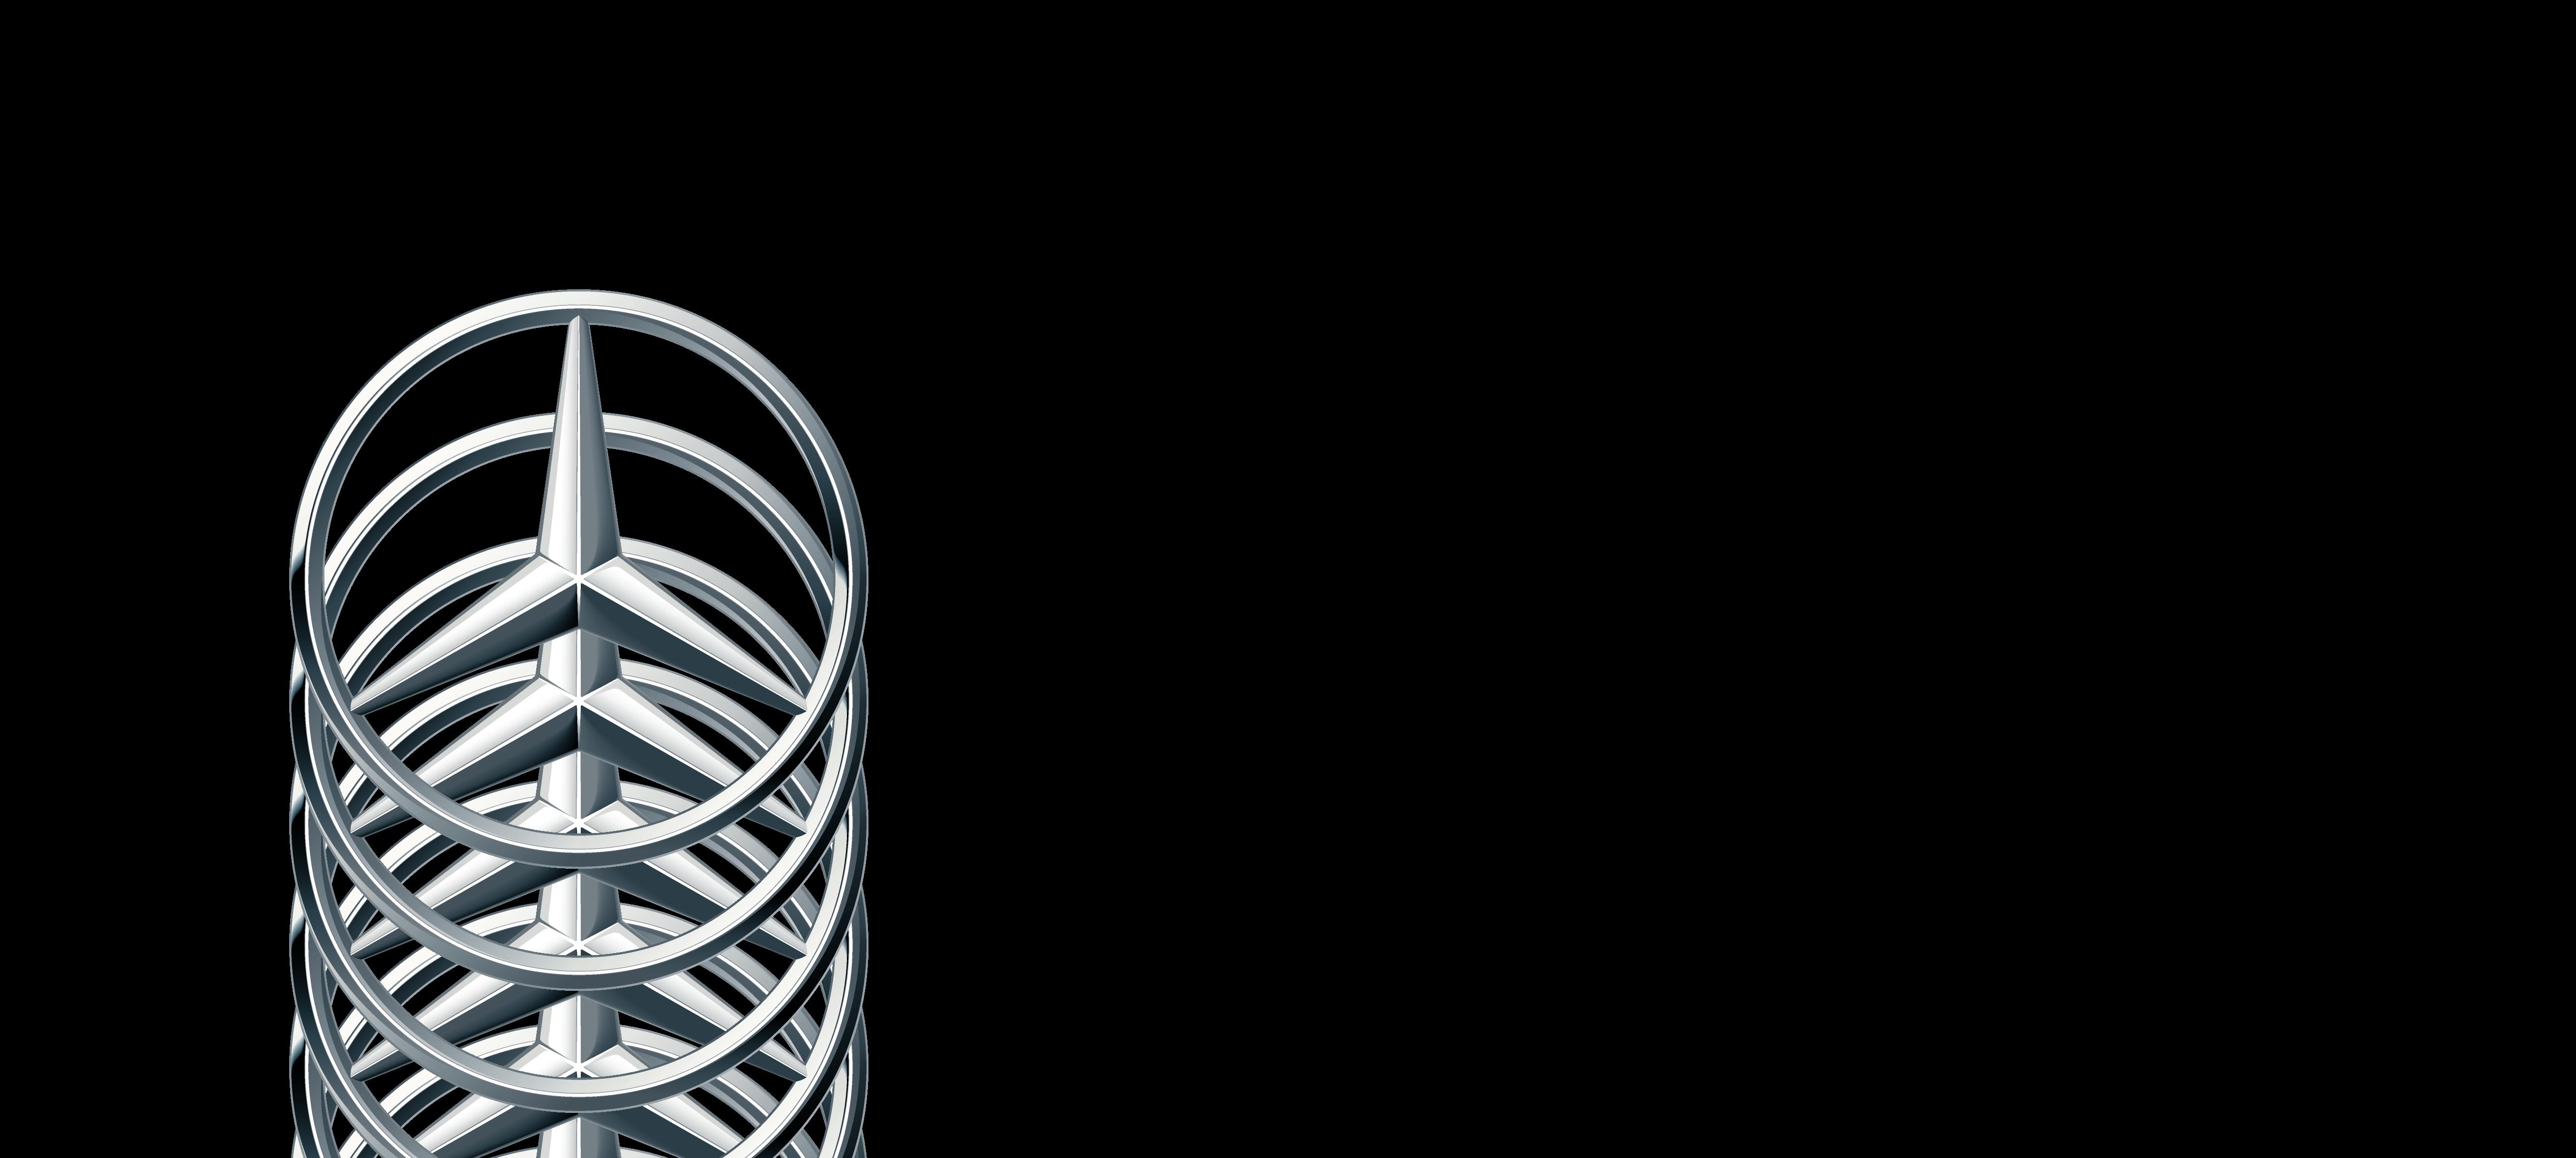 Mercedes Logo Transparent Background   image 462 5256x2362